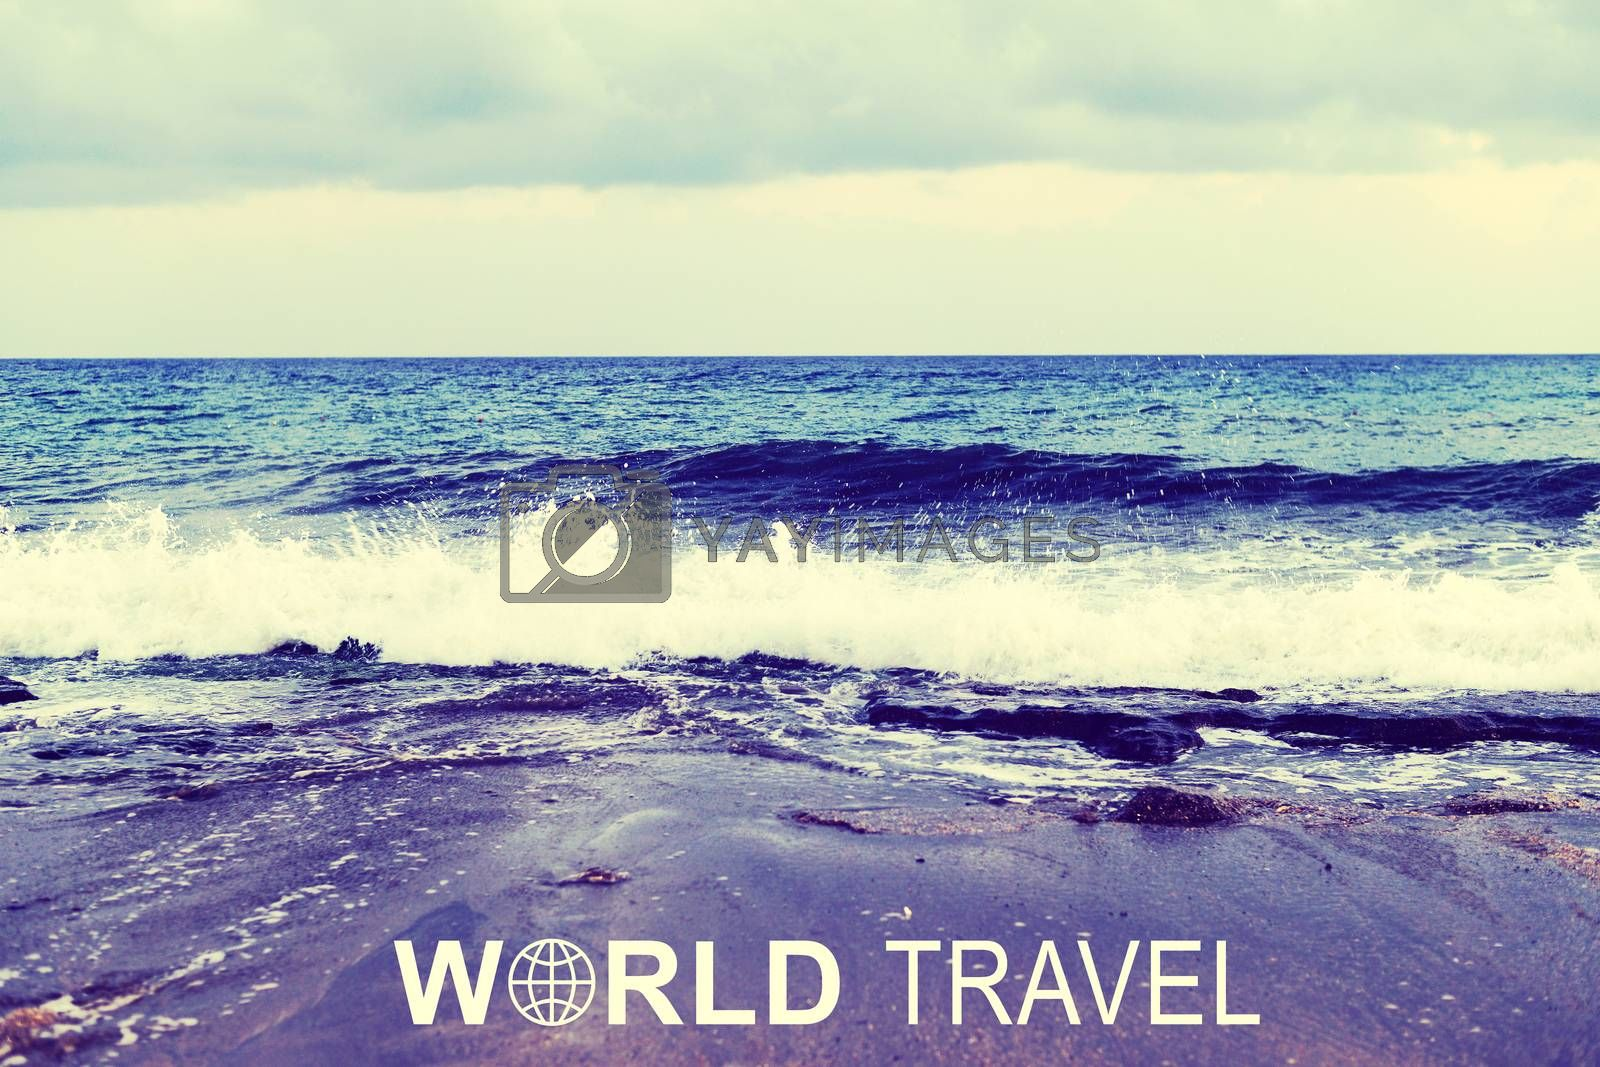 World Travel header by cherezoff